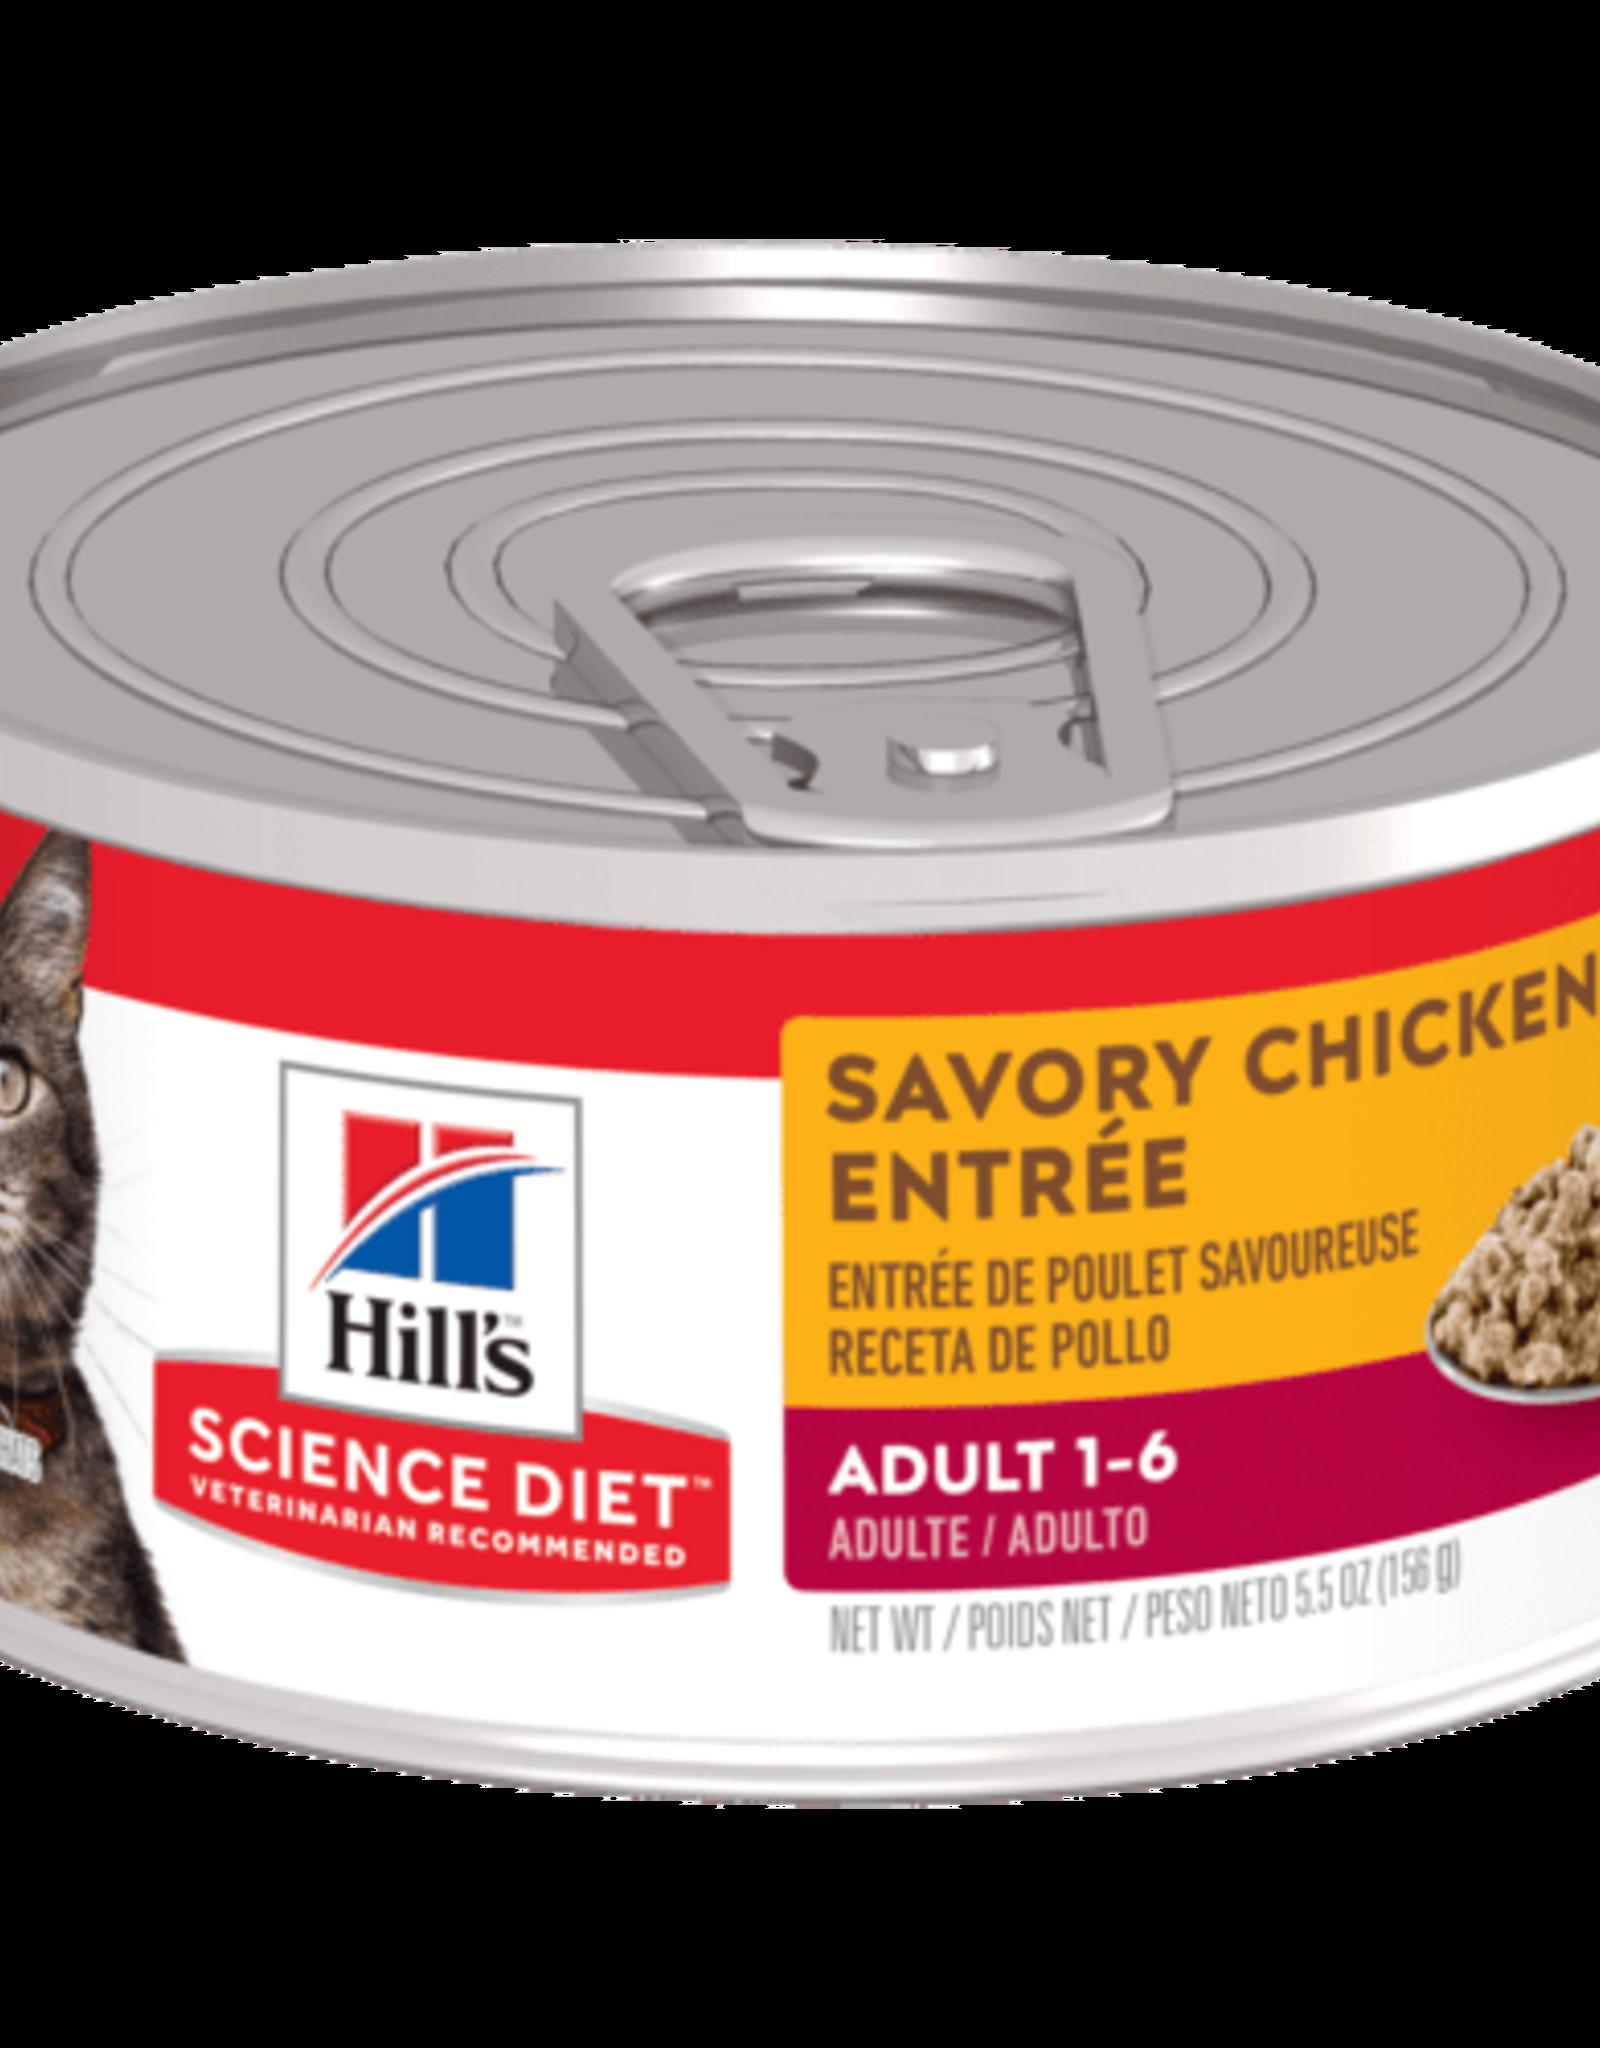 Hill's Science Diet Hill's Science Diet Feline Can 7+ Savoury Chicken Entree 156g